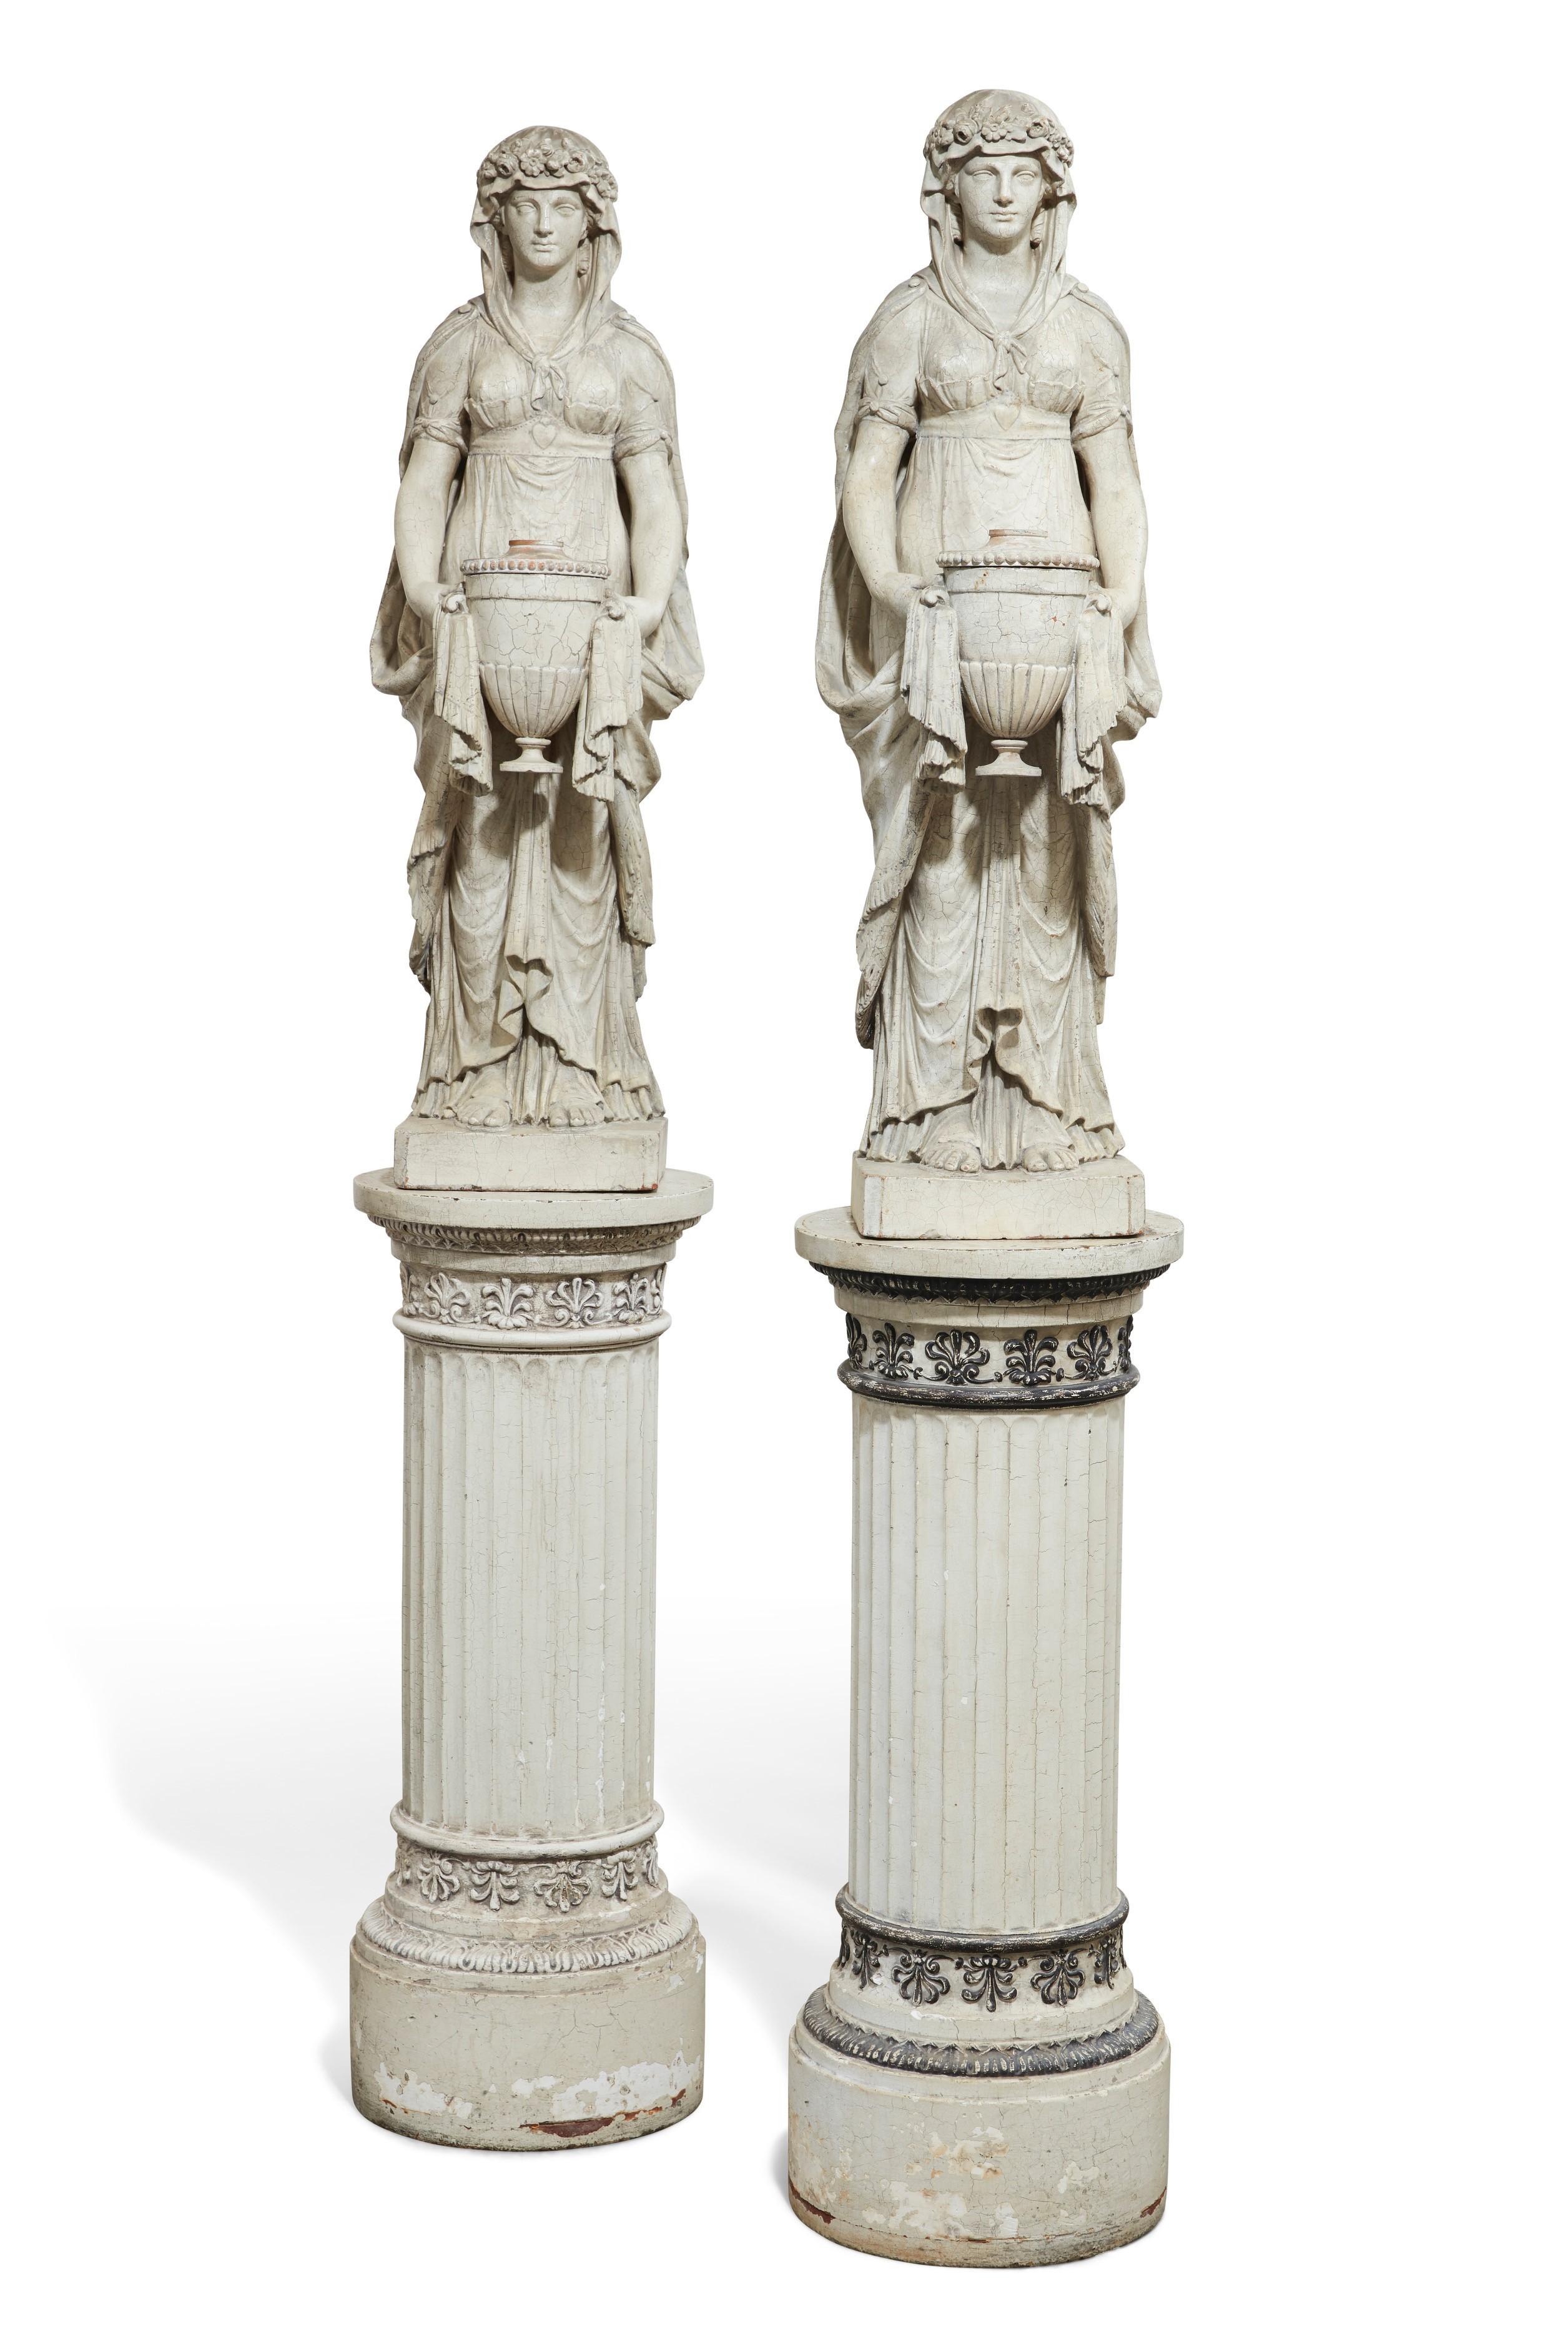 Pair of English Regency 19th century white painted terra cotta figures of vestal virgins, on later pedestals (est. $3,000-5,000).